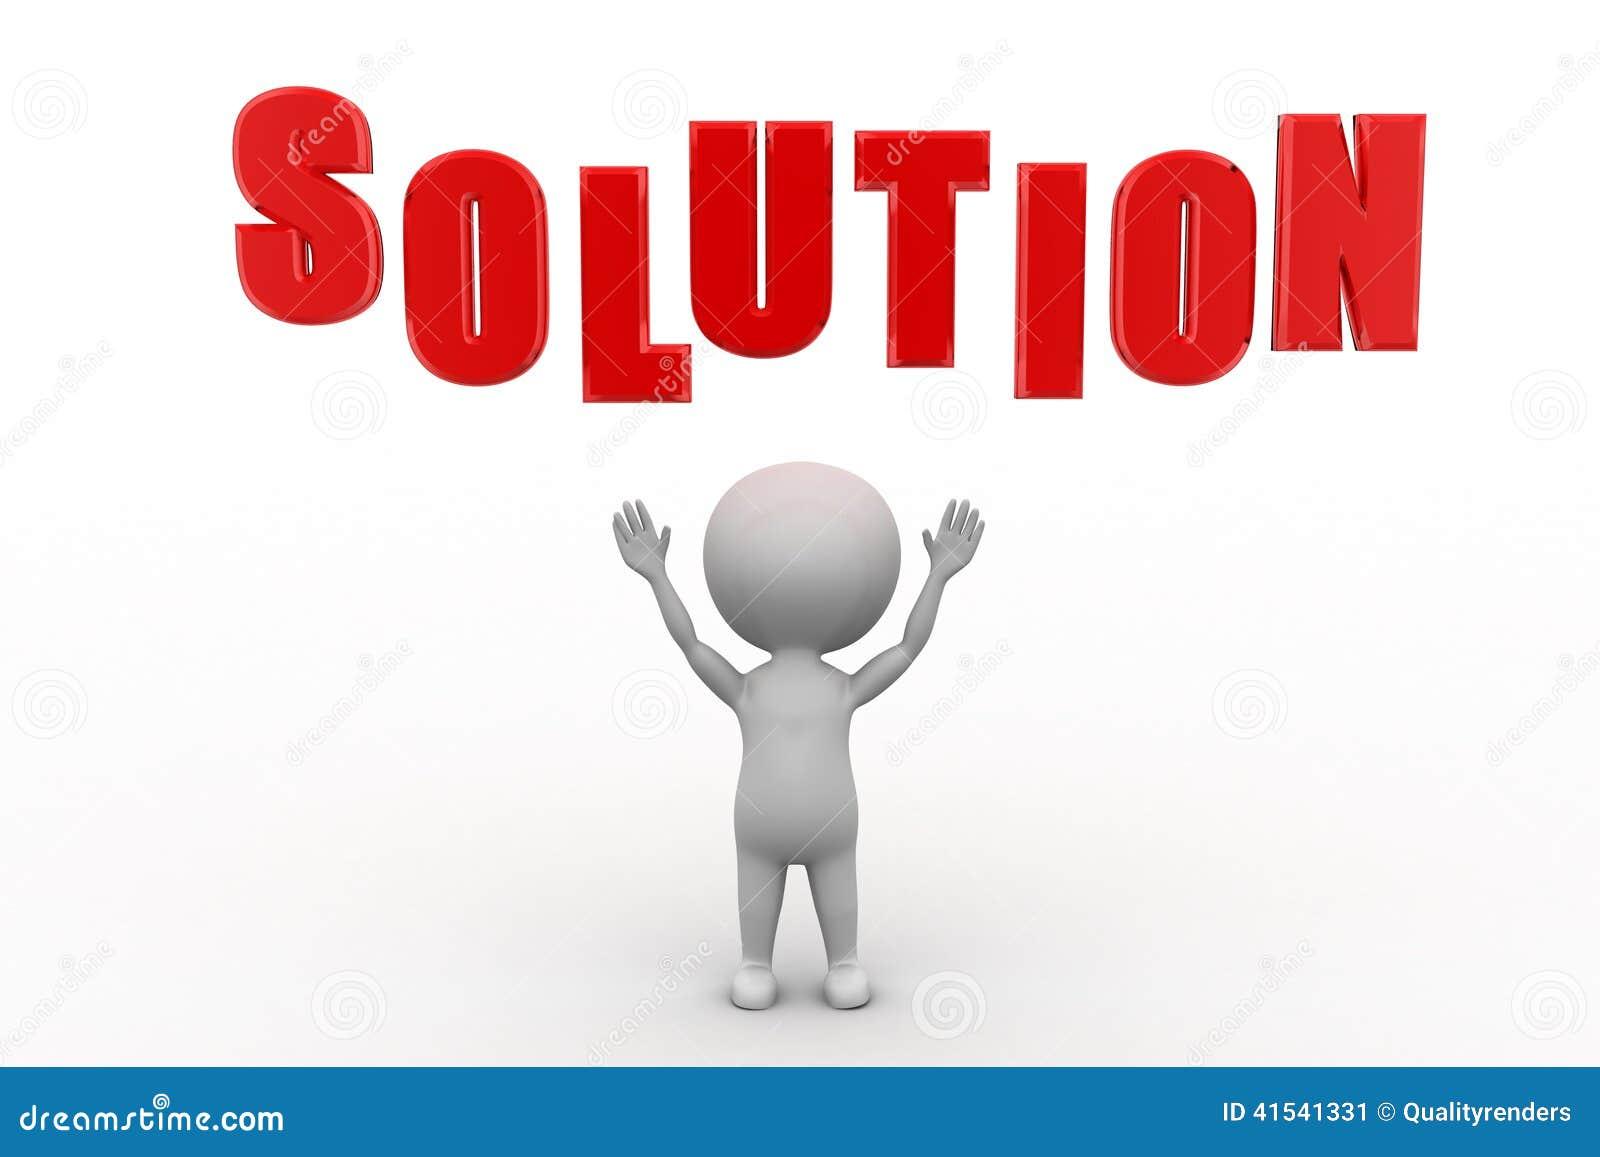 Stock Image 3d Man Solution Concept Image 41541331